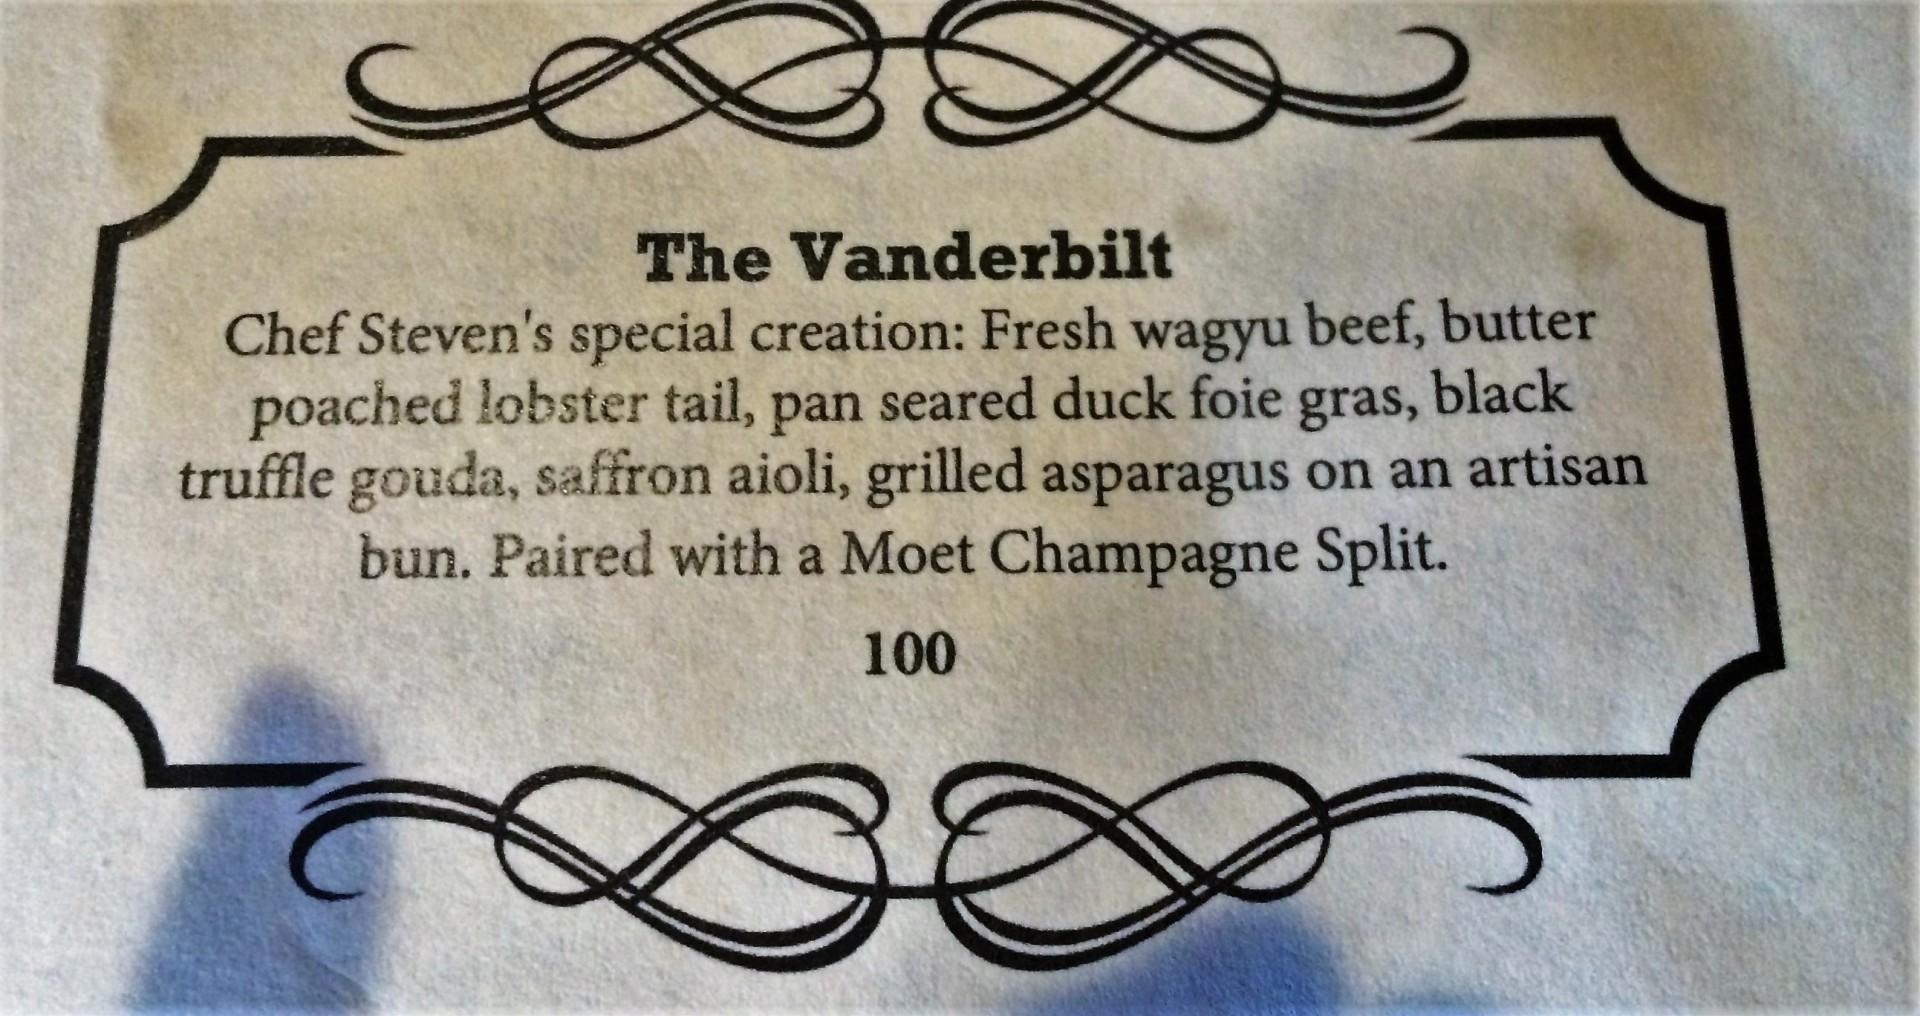 The Vanderbilt